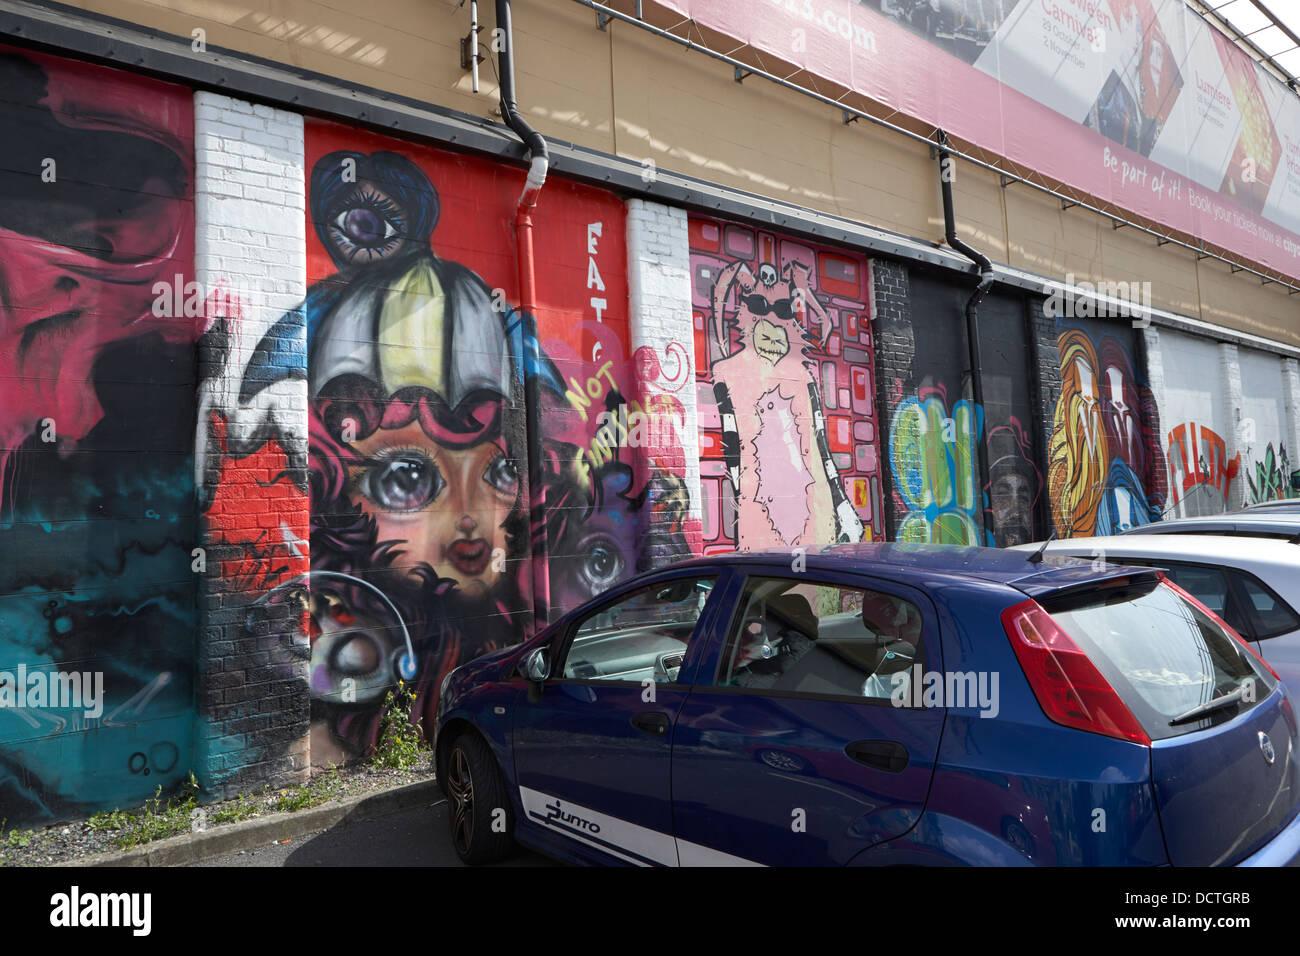 Graffiti wall uk - Stock Photo Graffiti Wall Art In A Public Car Park In Belfast Northern Ireland Uk